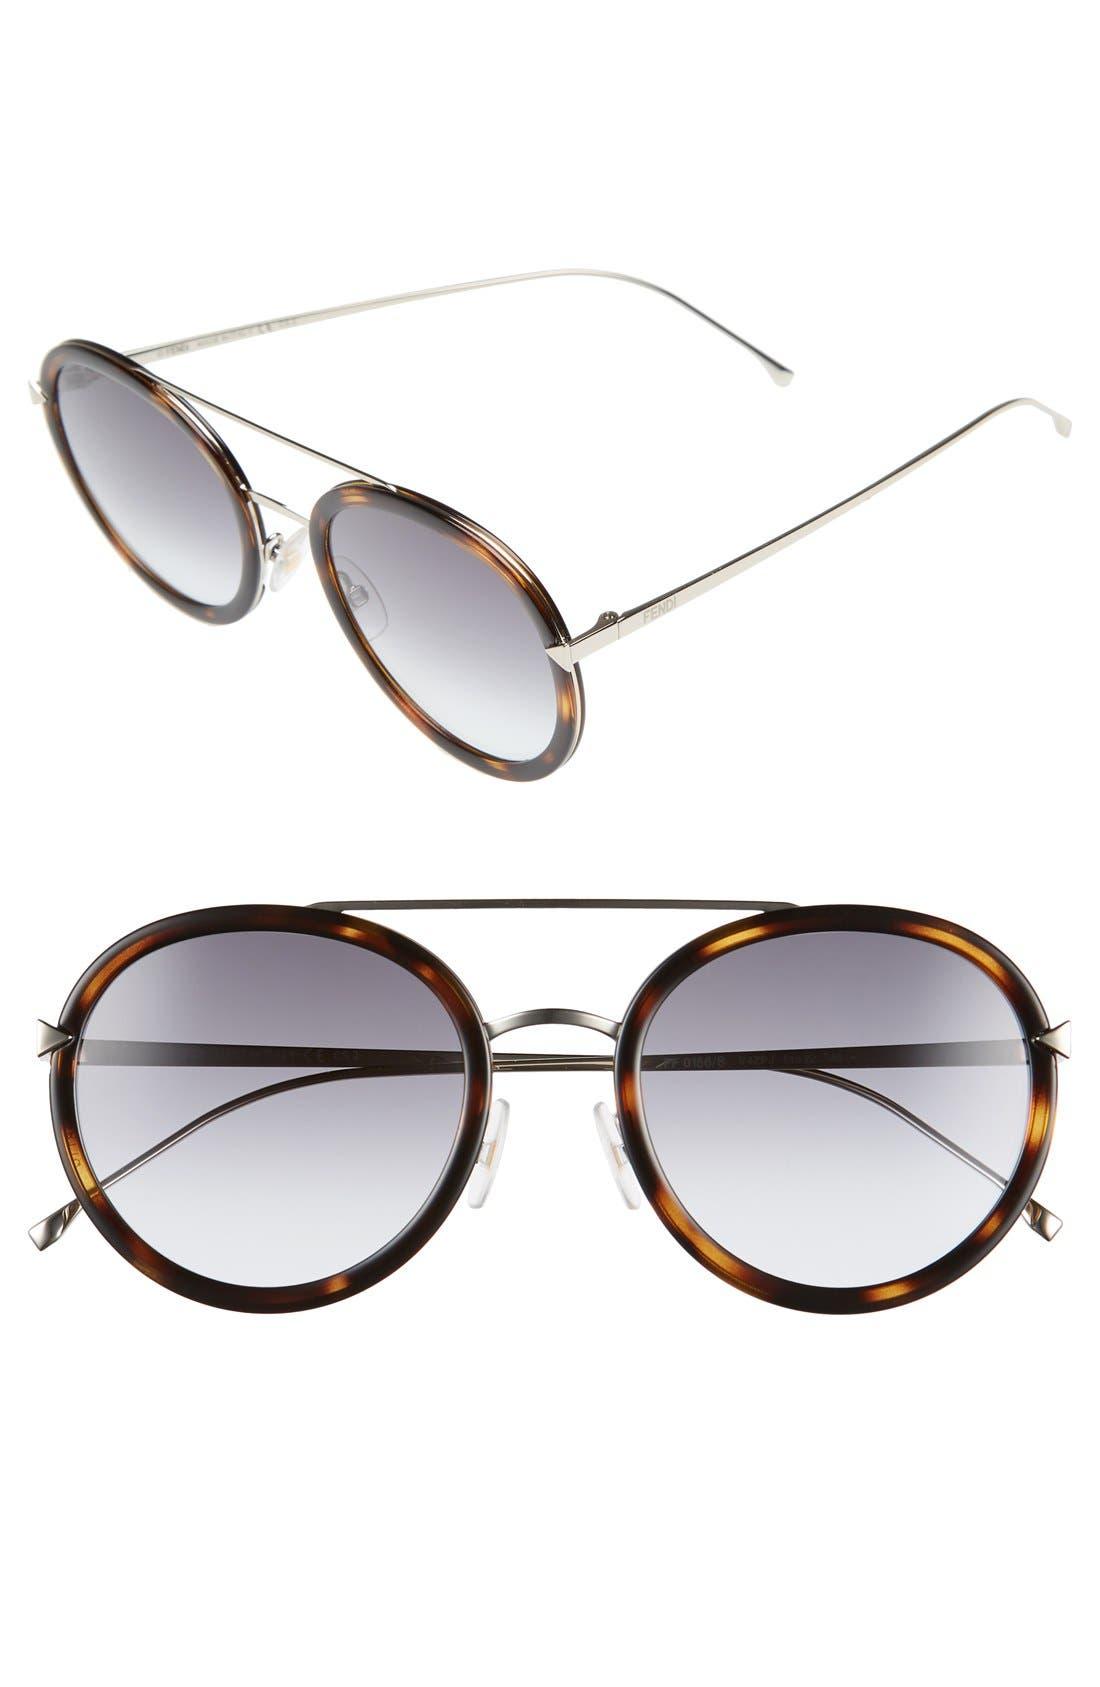 51mm Round Aviator Sunglasses,                             Main thumbnail 1, color,                             HAVANA/ GOLD